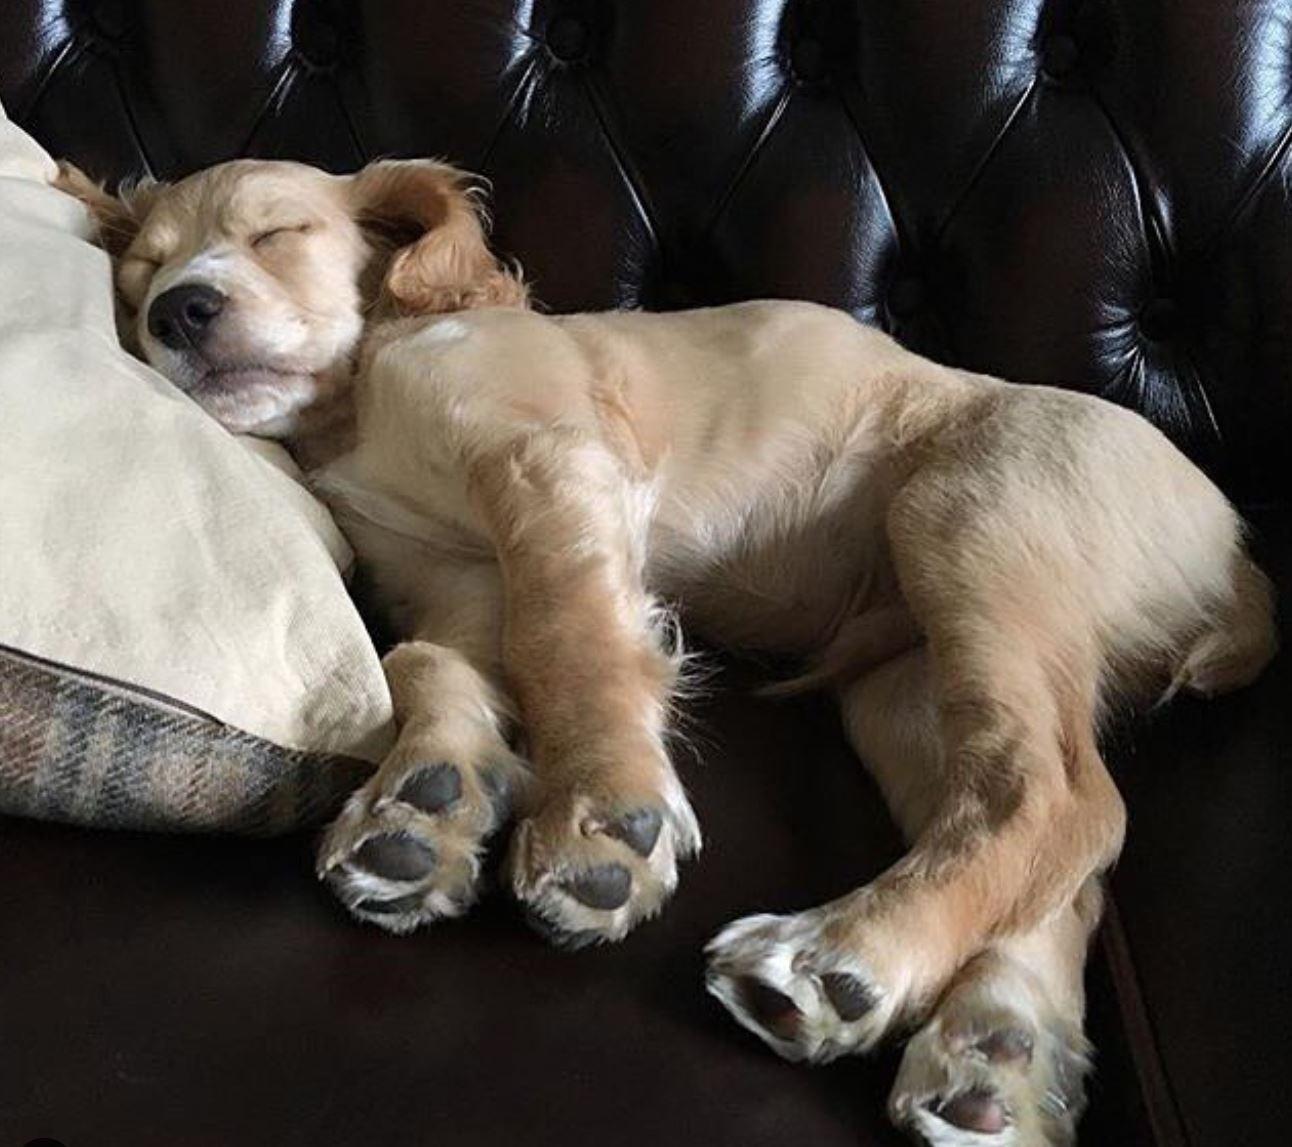 Cocker spaniel sleeping